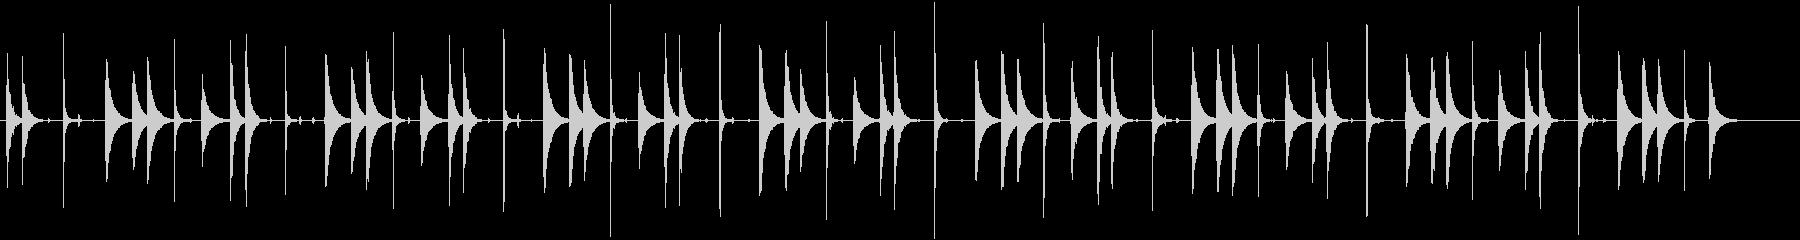 Guanguanco:ラテンリズム...の未再生の波形